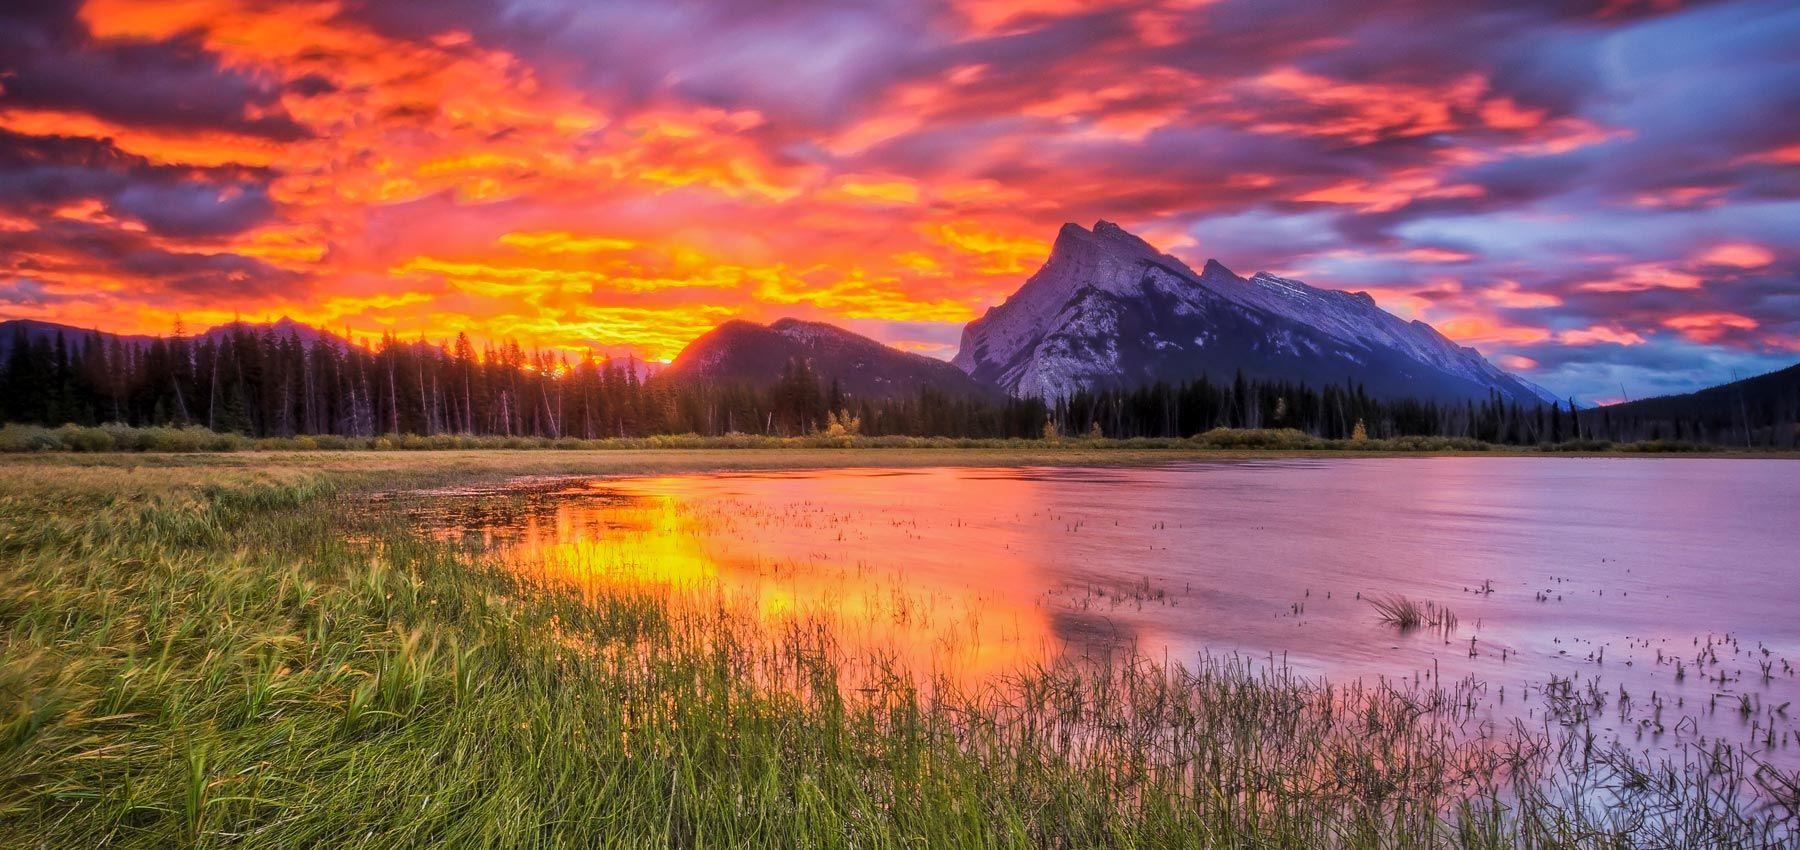 Banff, Alberta, Canada - Official Website of the Town of Banff, Alberta